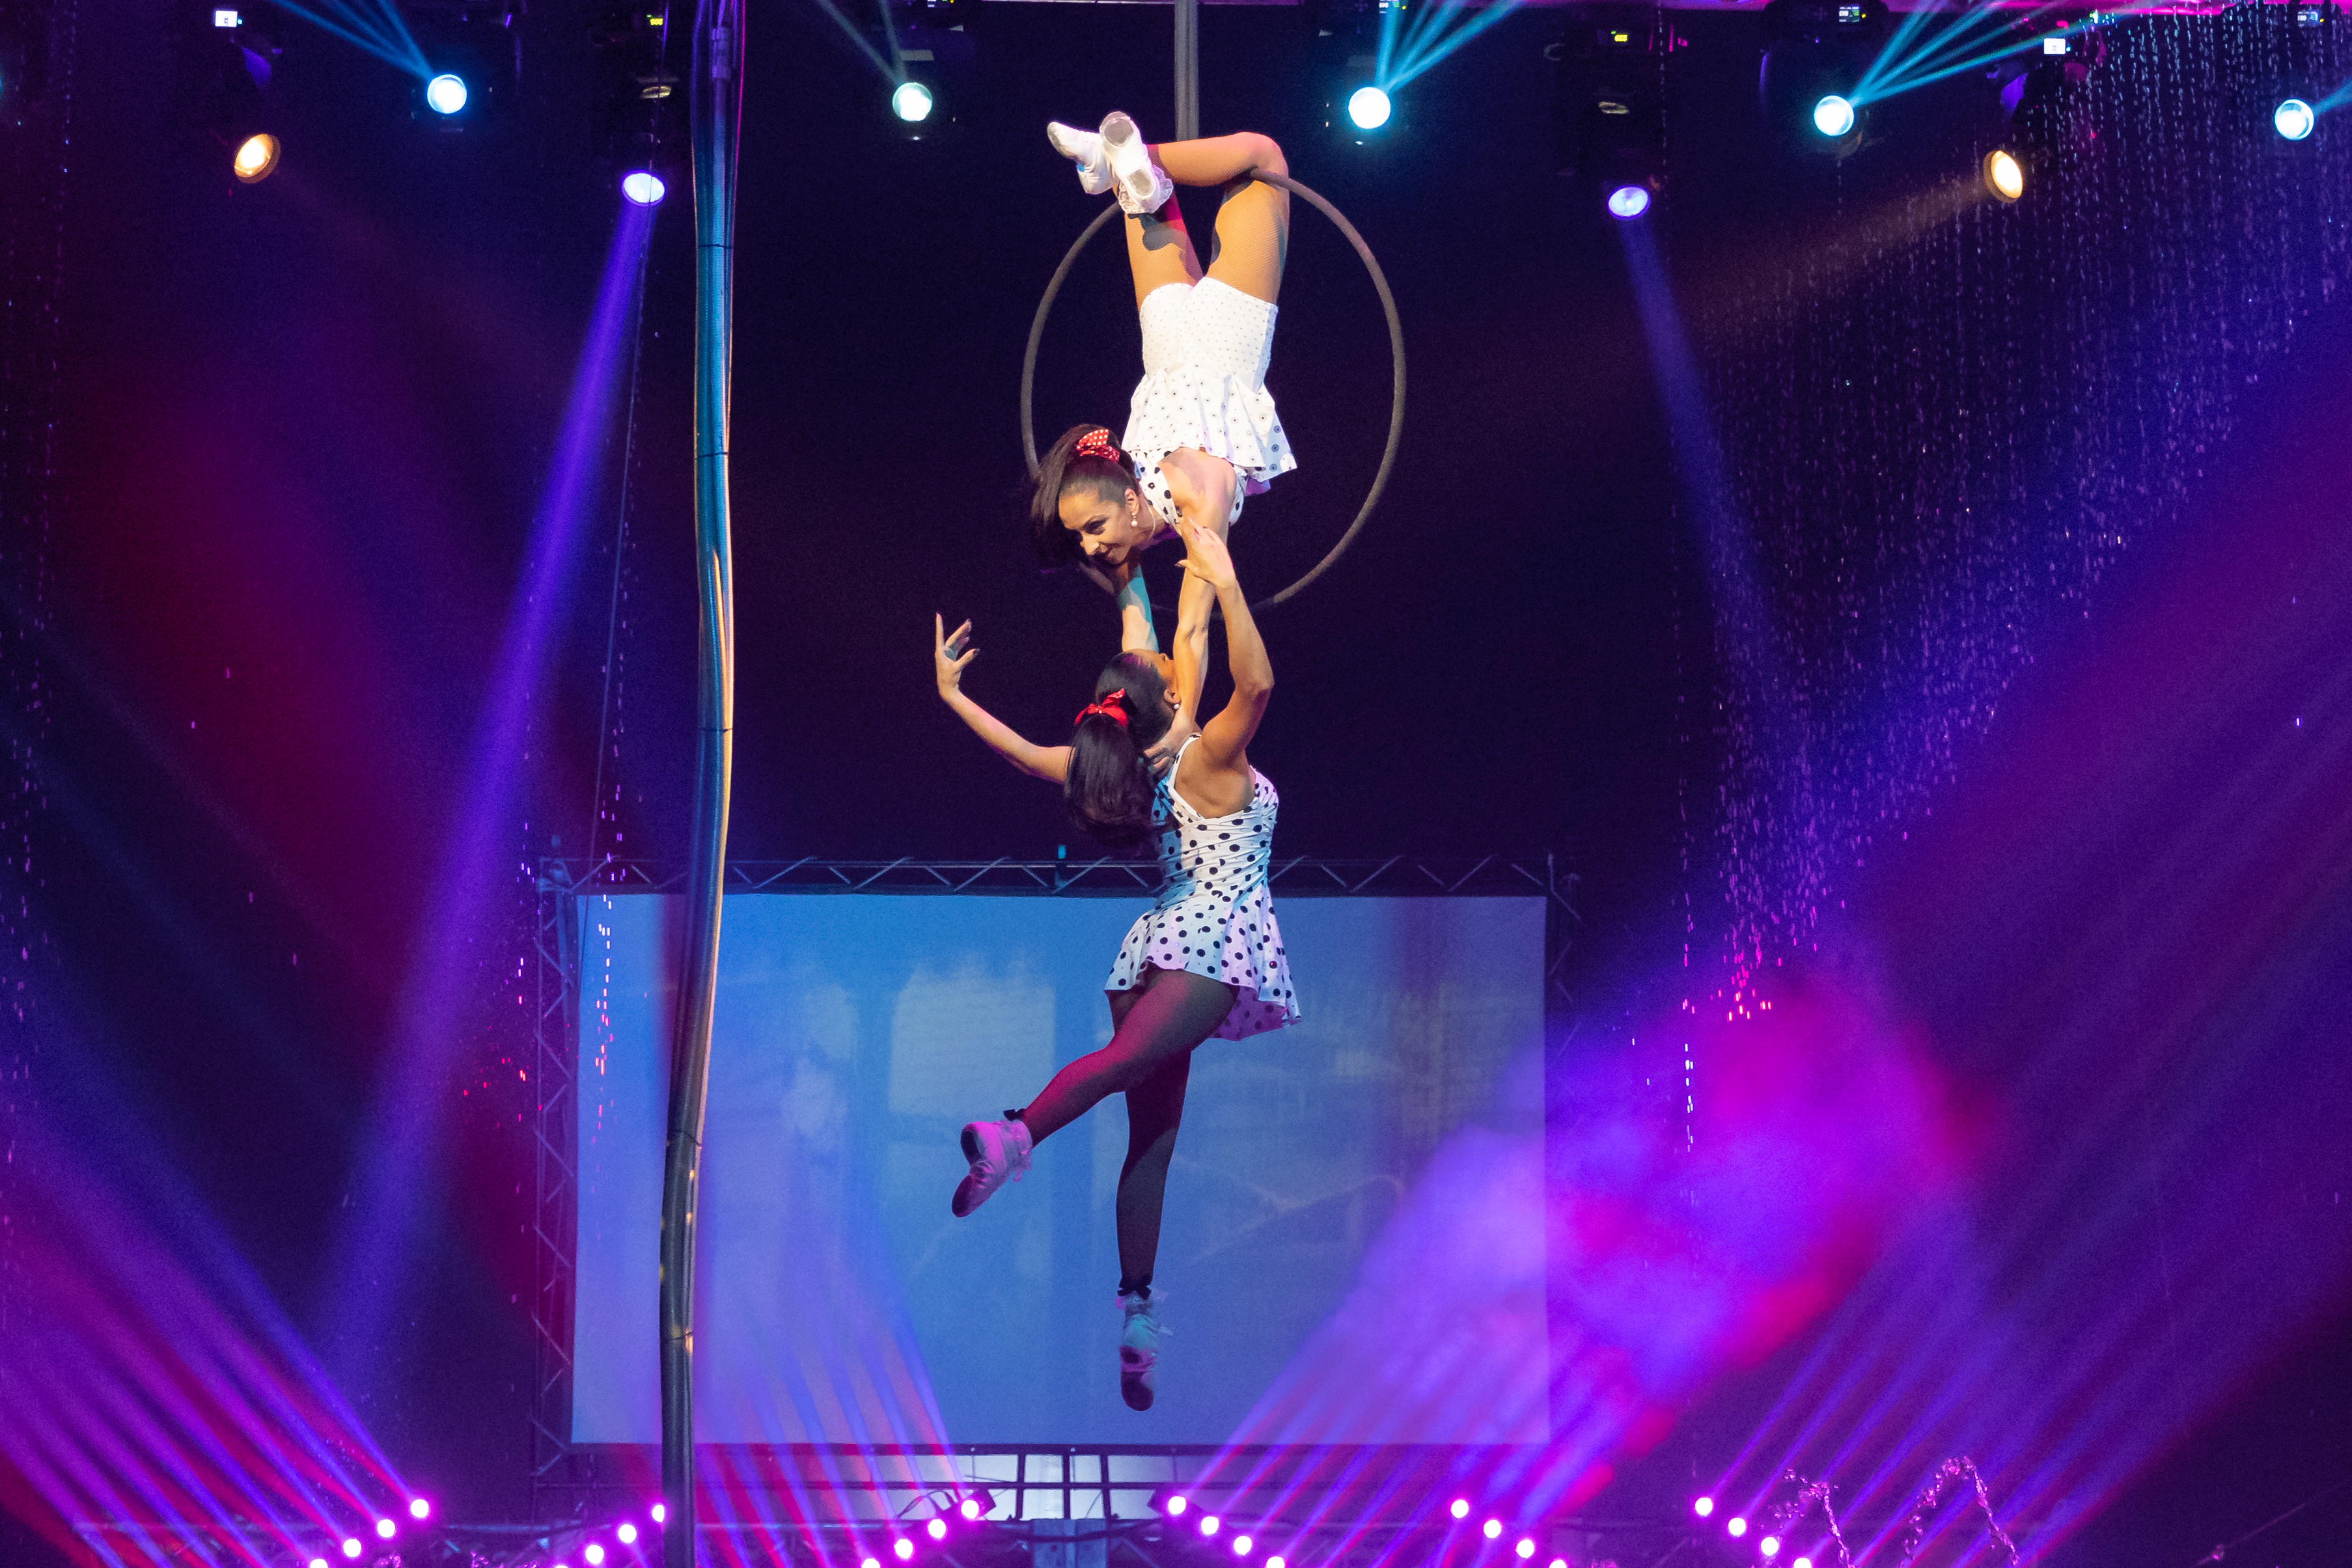 Submitted Aerial Lyra Duo - Roxana Midi & Susana Silva -Michael Seeley (7).jpg